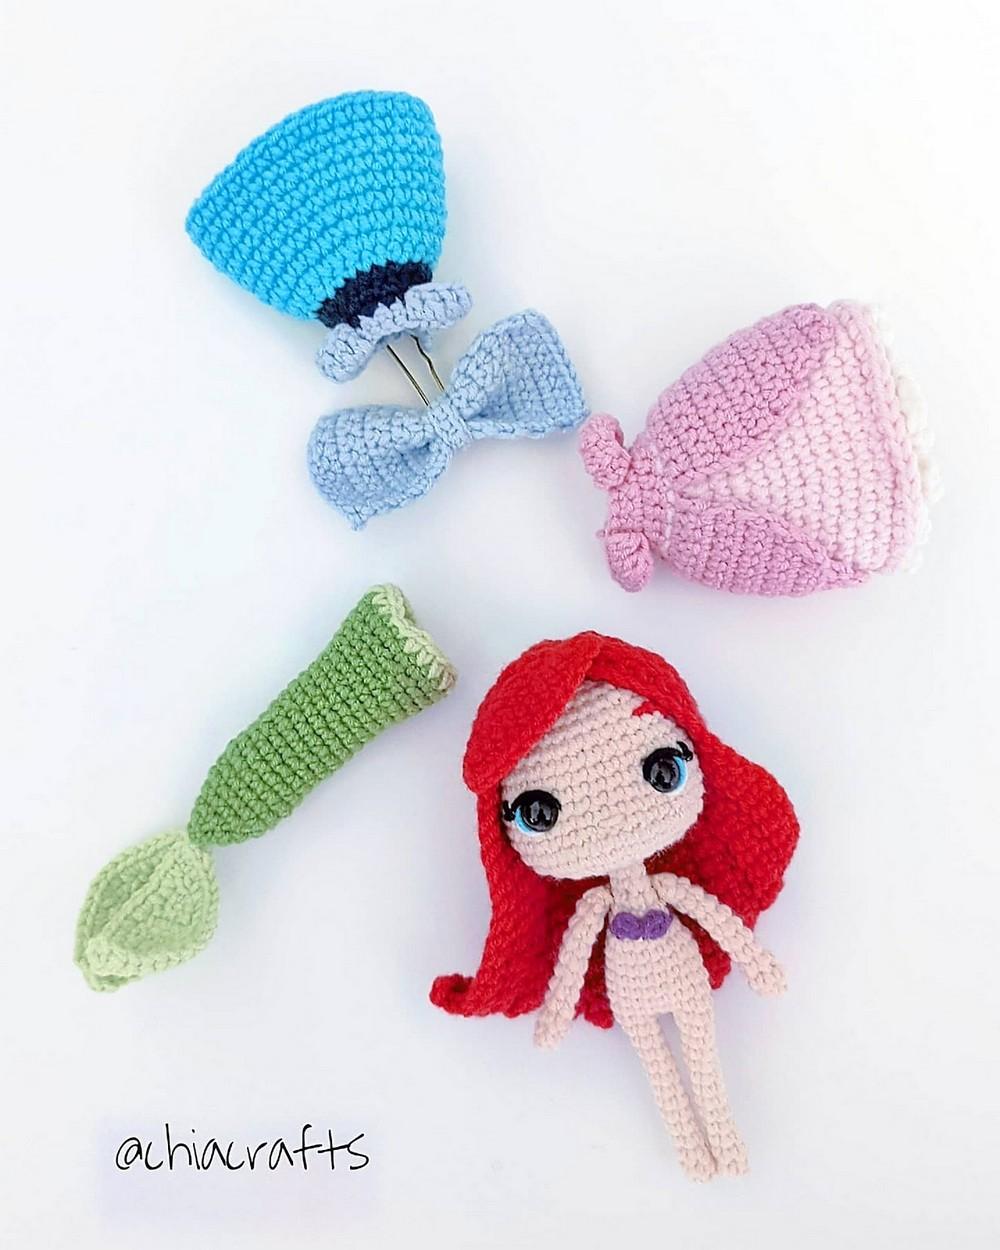 Crochet Little Mermaid Amigurumi Pattern